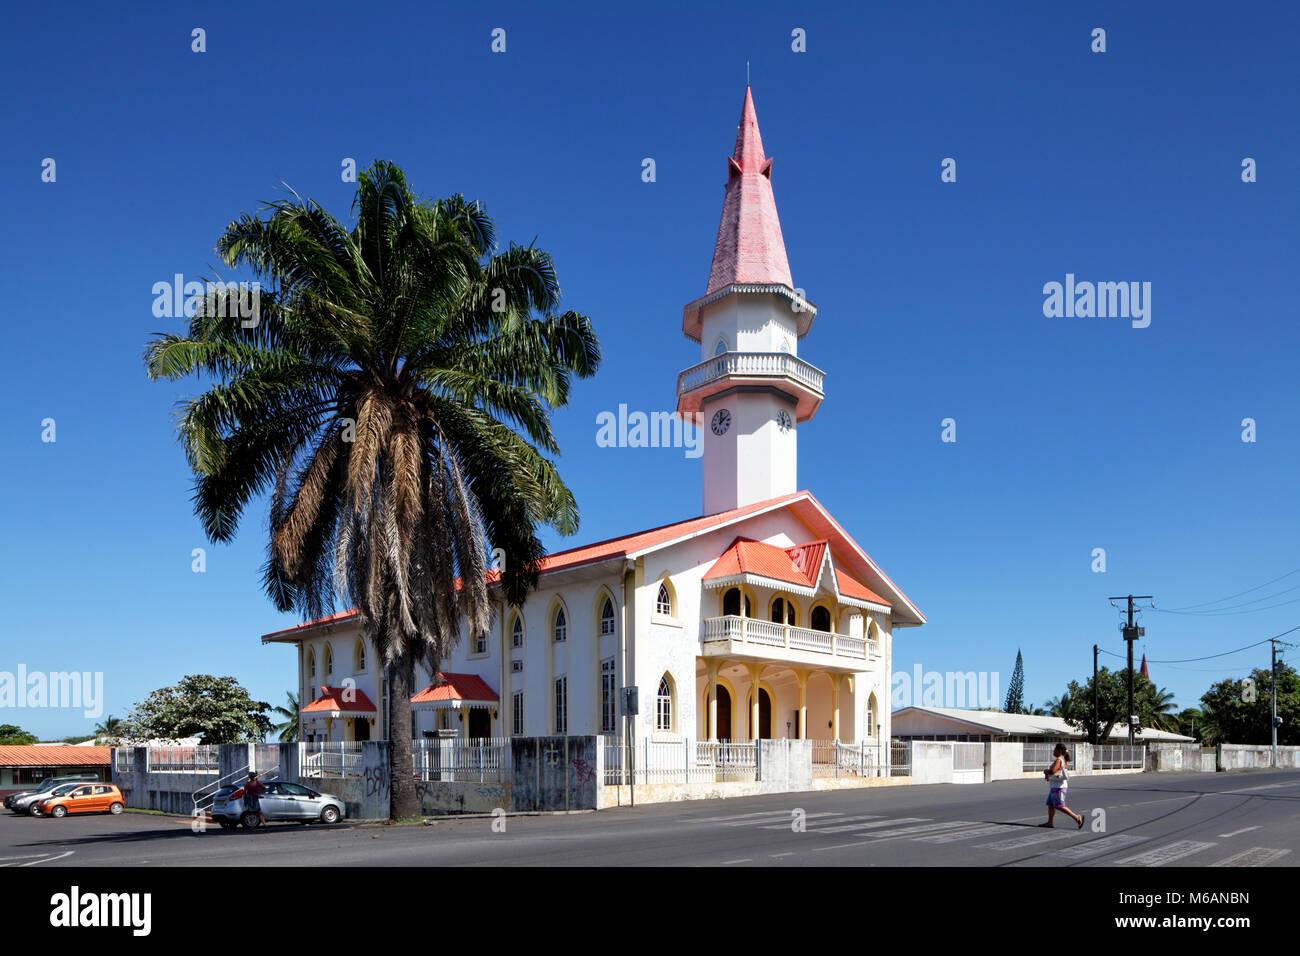 Protestant Church in Papara, Tahiti, French Polynesia - Stock Image